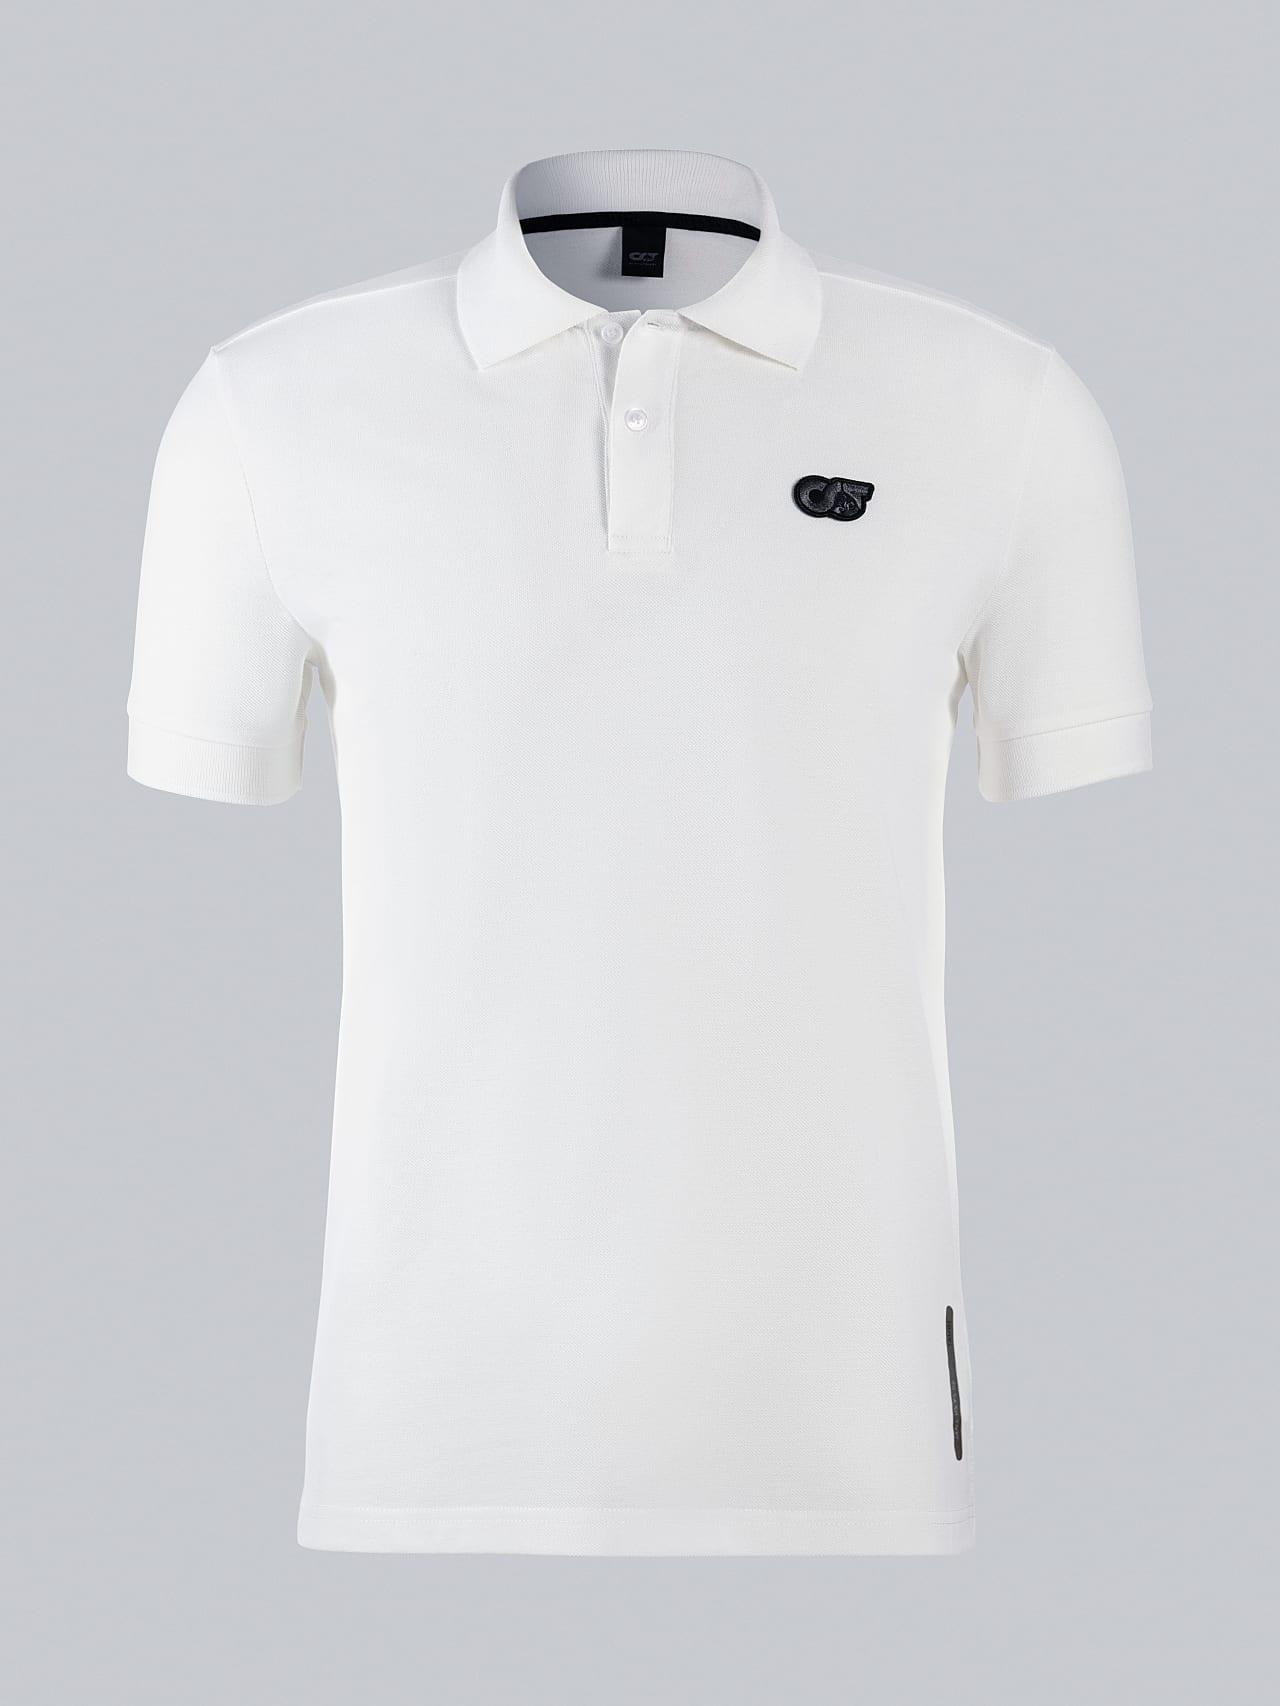 JANX V5.Y5.02 Pique Polo Shirt offwhite Back Alpha Tauri